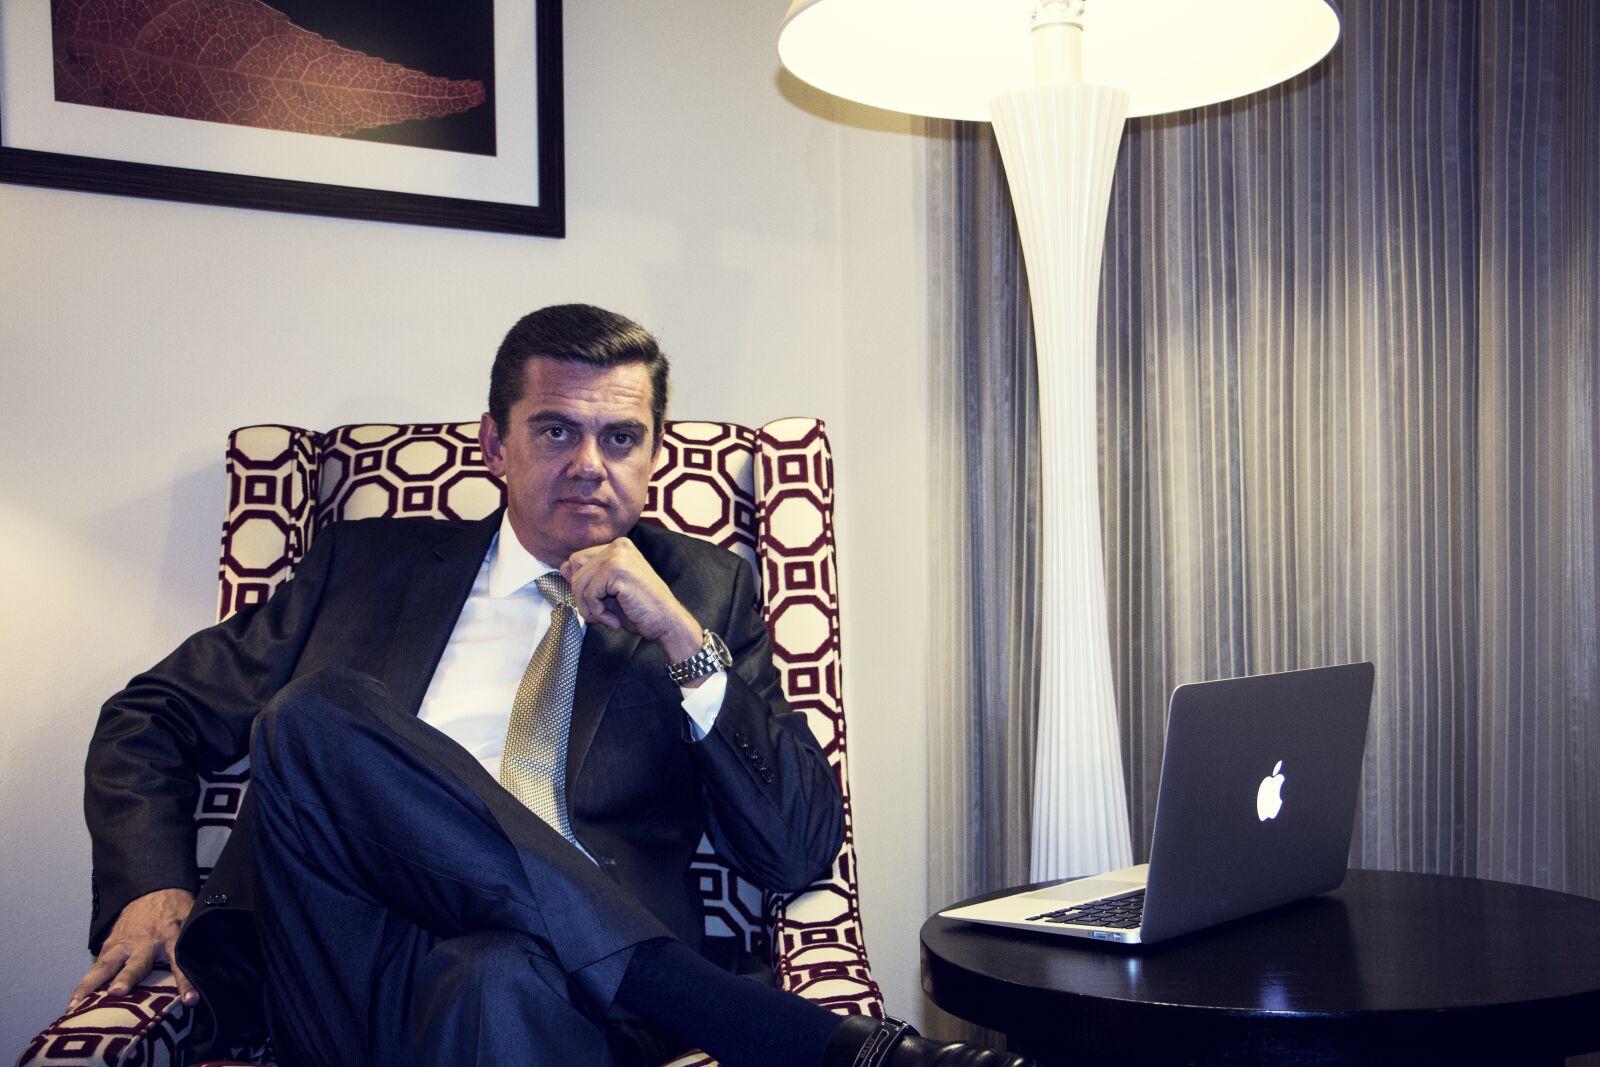 attorney, businesman, businessman, executive